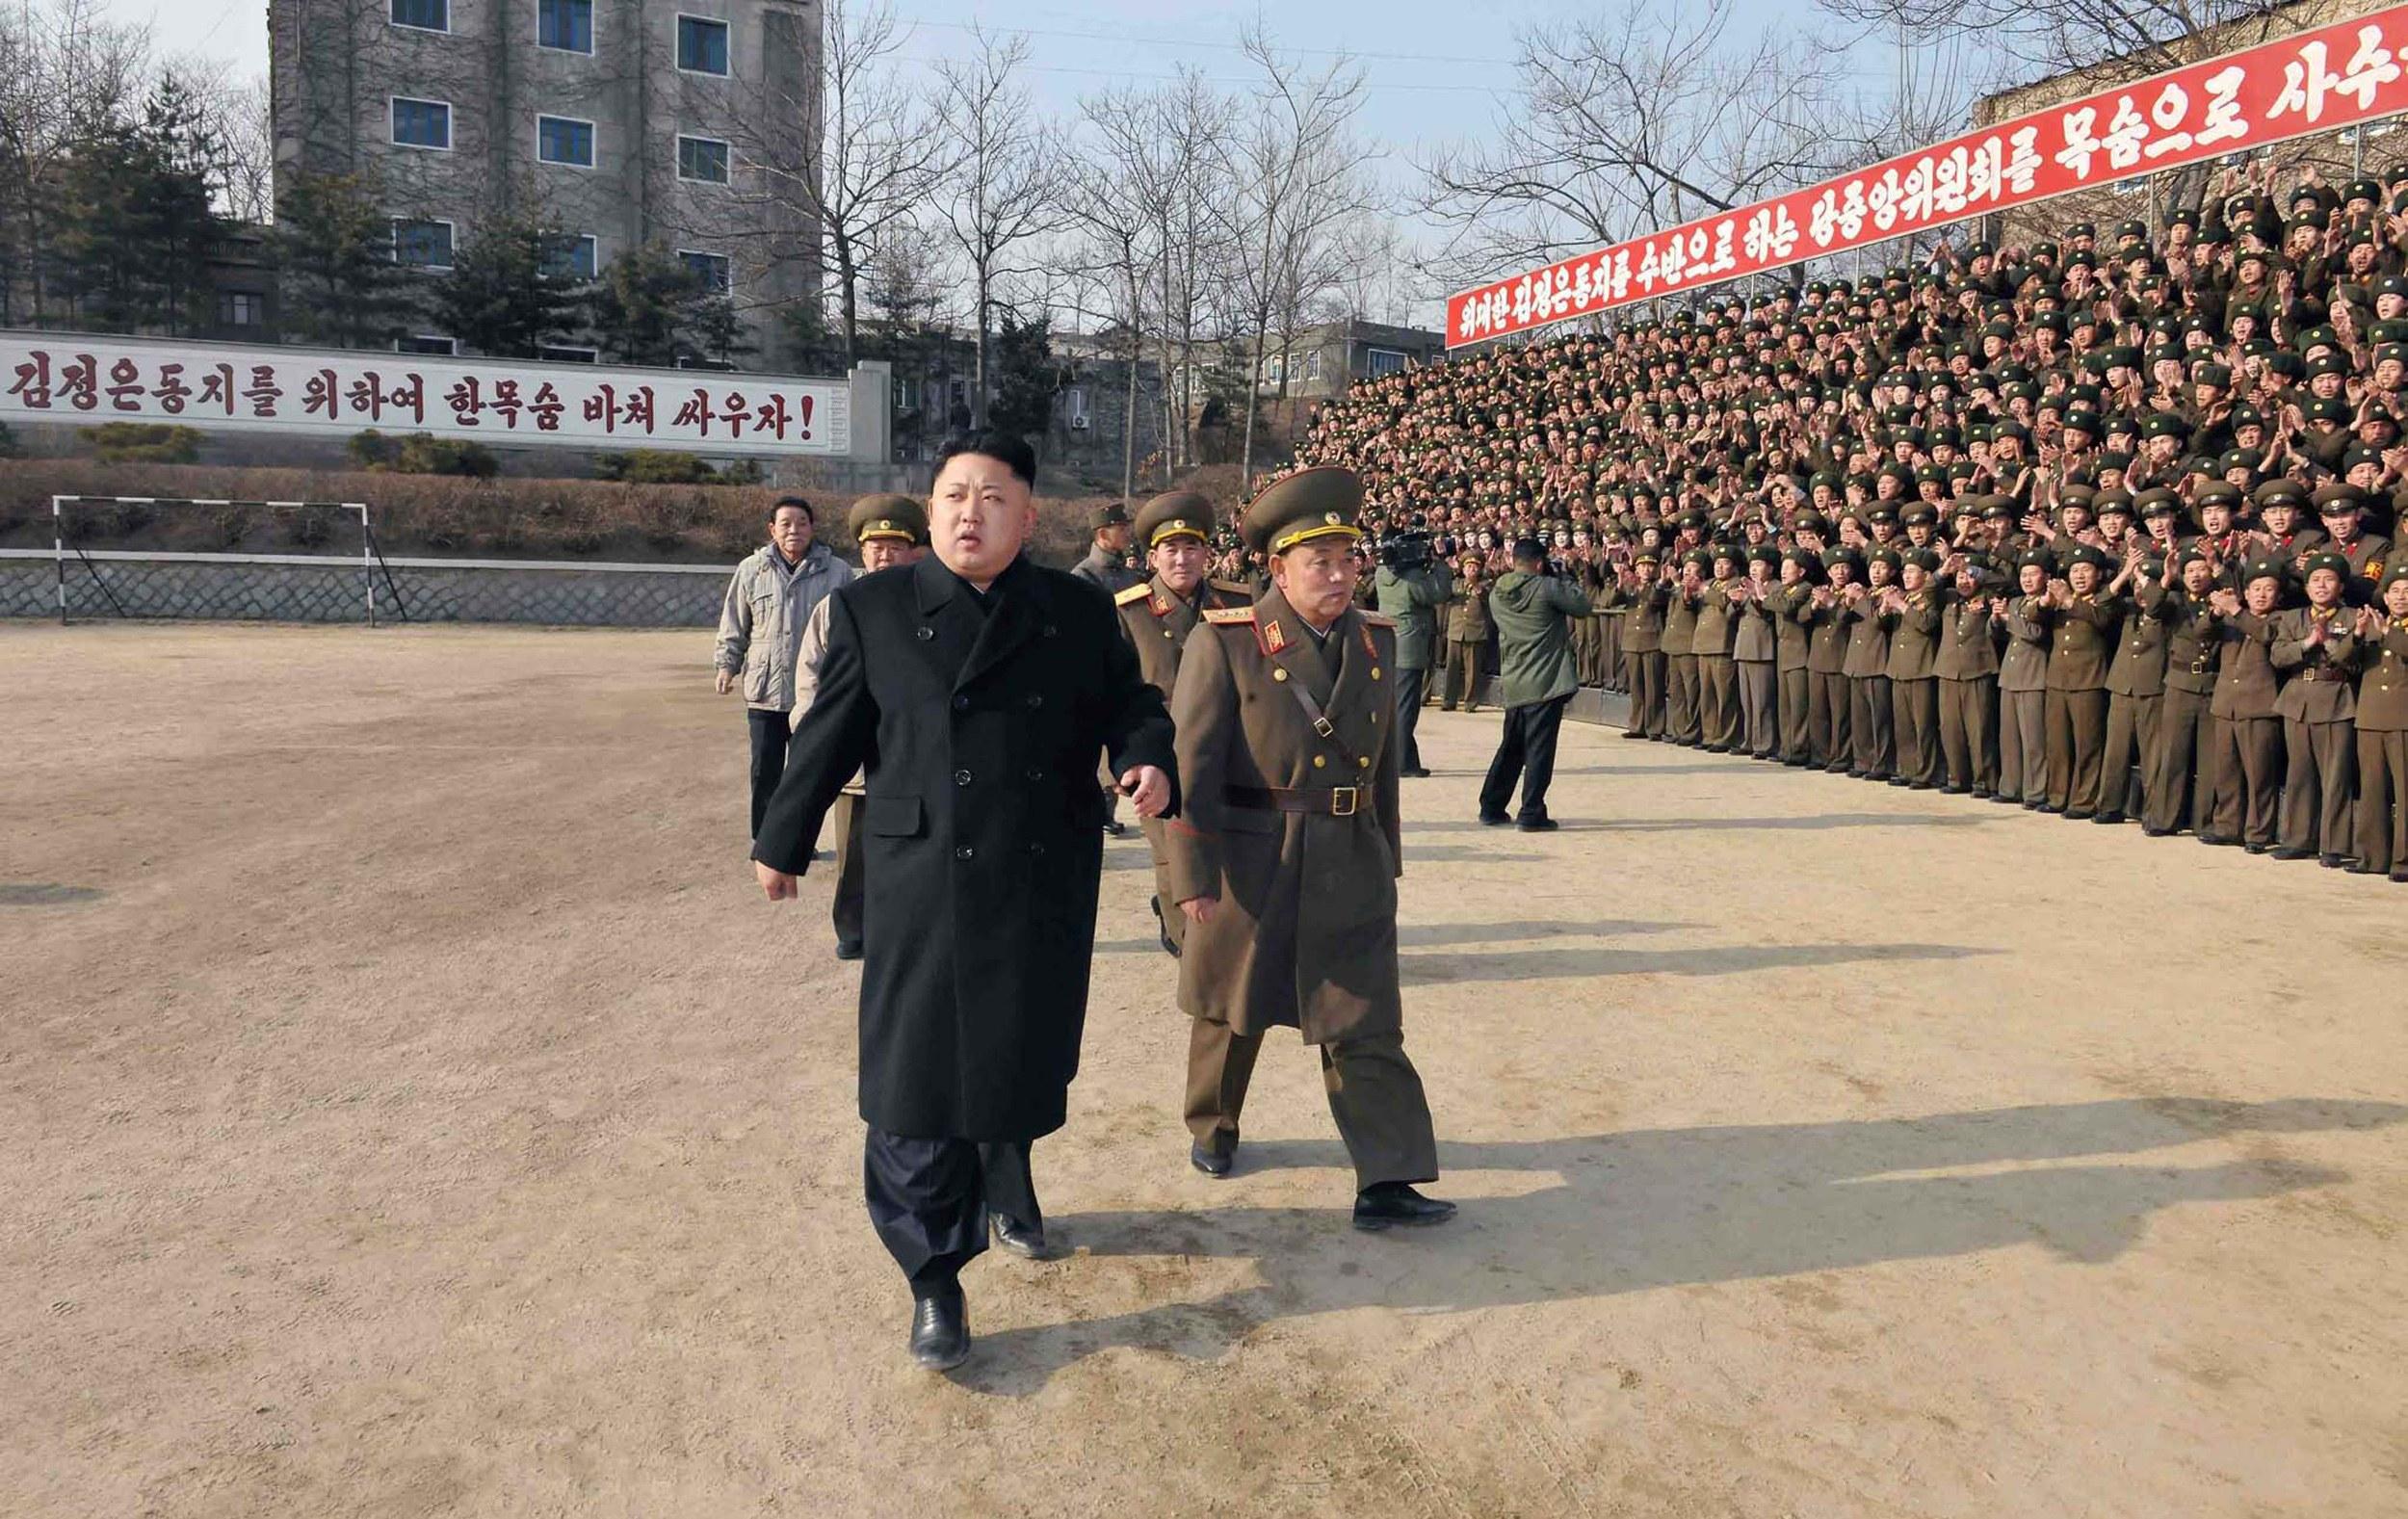 Kim Jong-un with his army